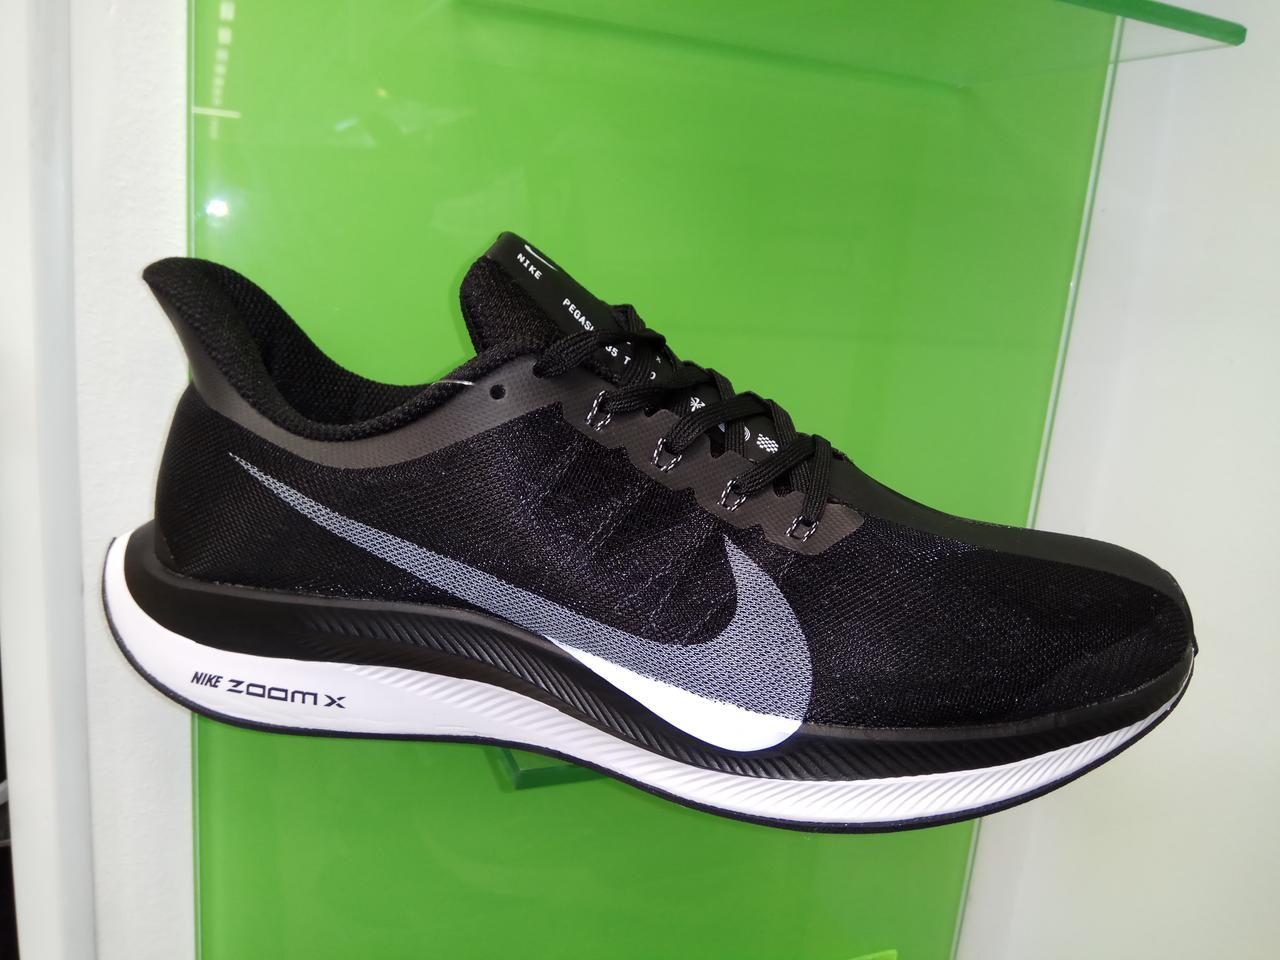 de6f815fe0a0fb Мужские кроссовки Nike Zoom Pegasus 35 Turbo black & white, размеры с 41 по  45